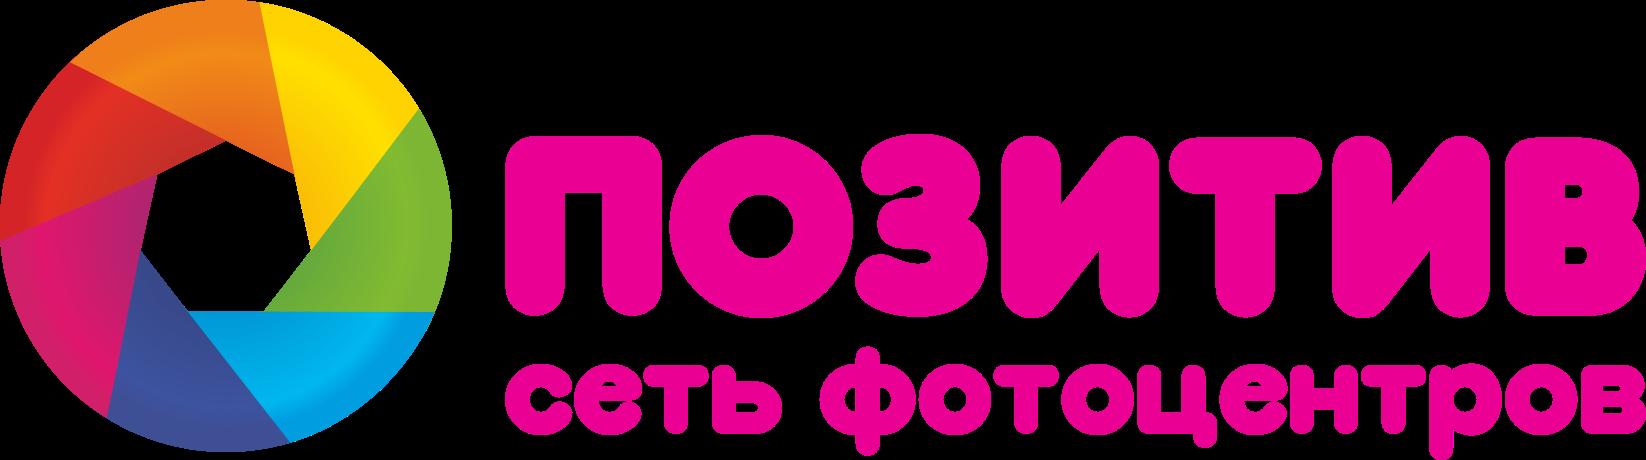 Фотоцентр «Позитив», Кемля, респ. Мордовия